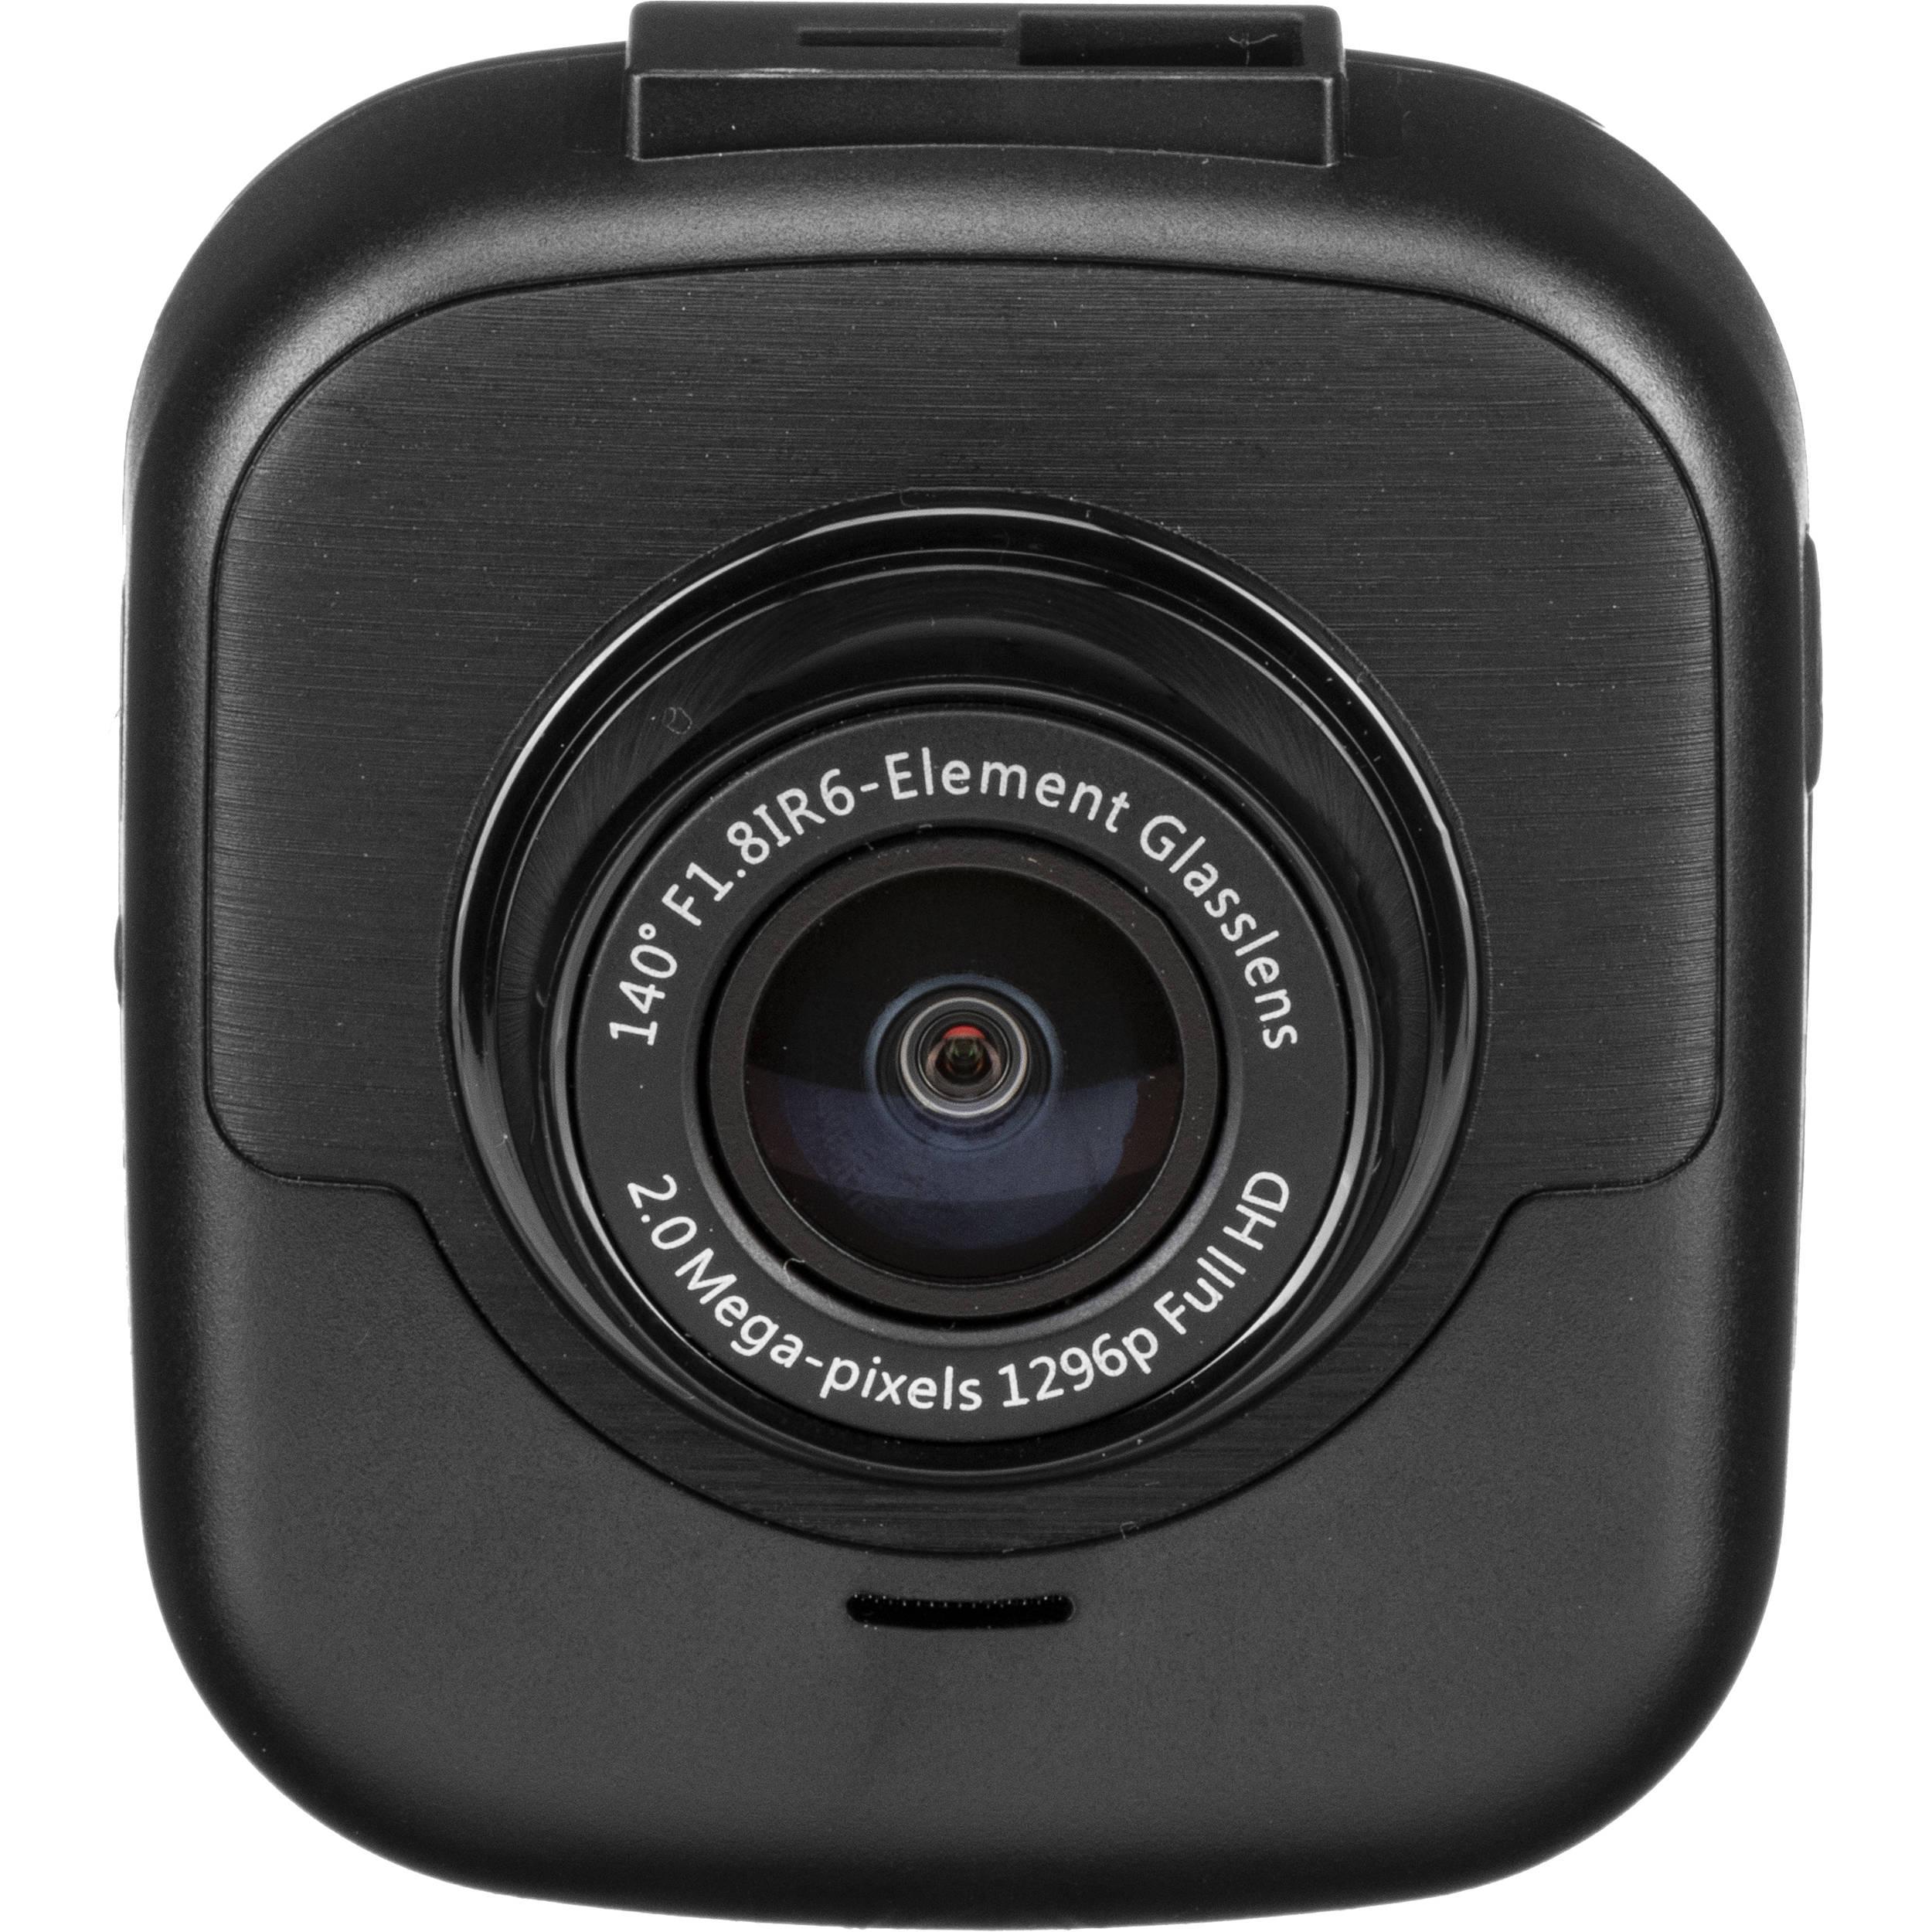 myGEKOgear Geko Orbit 530 1296p SHD Sony Sensor Dash Cam with Built-in Wi-Fi Night Vision and 16GB Micro SD Card